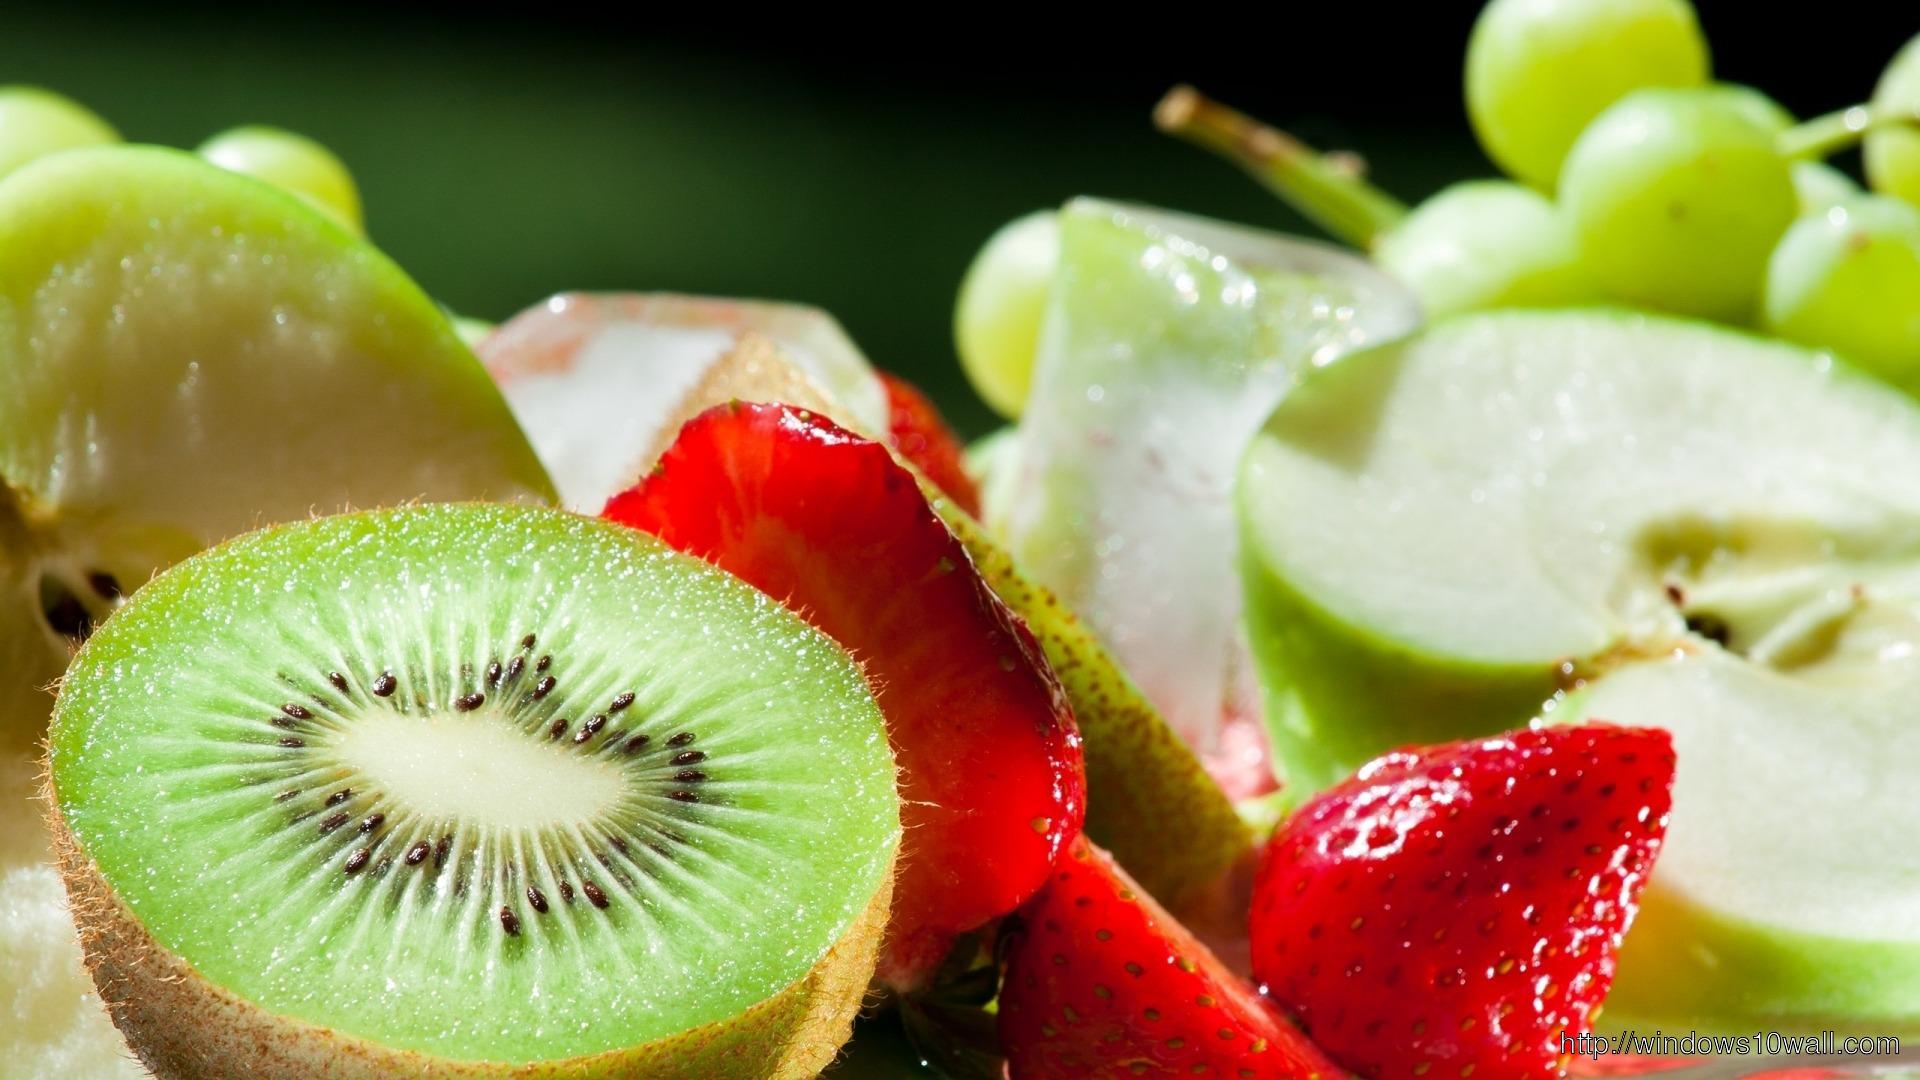 cute-fruits-wallpaper